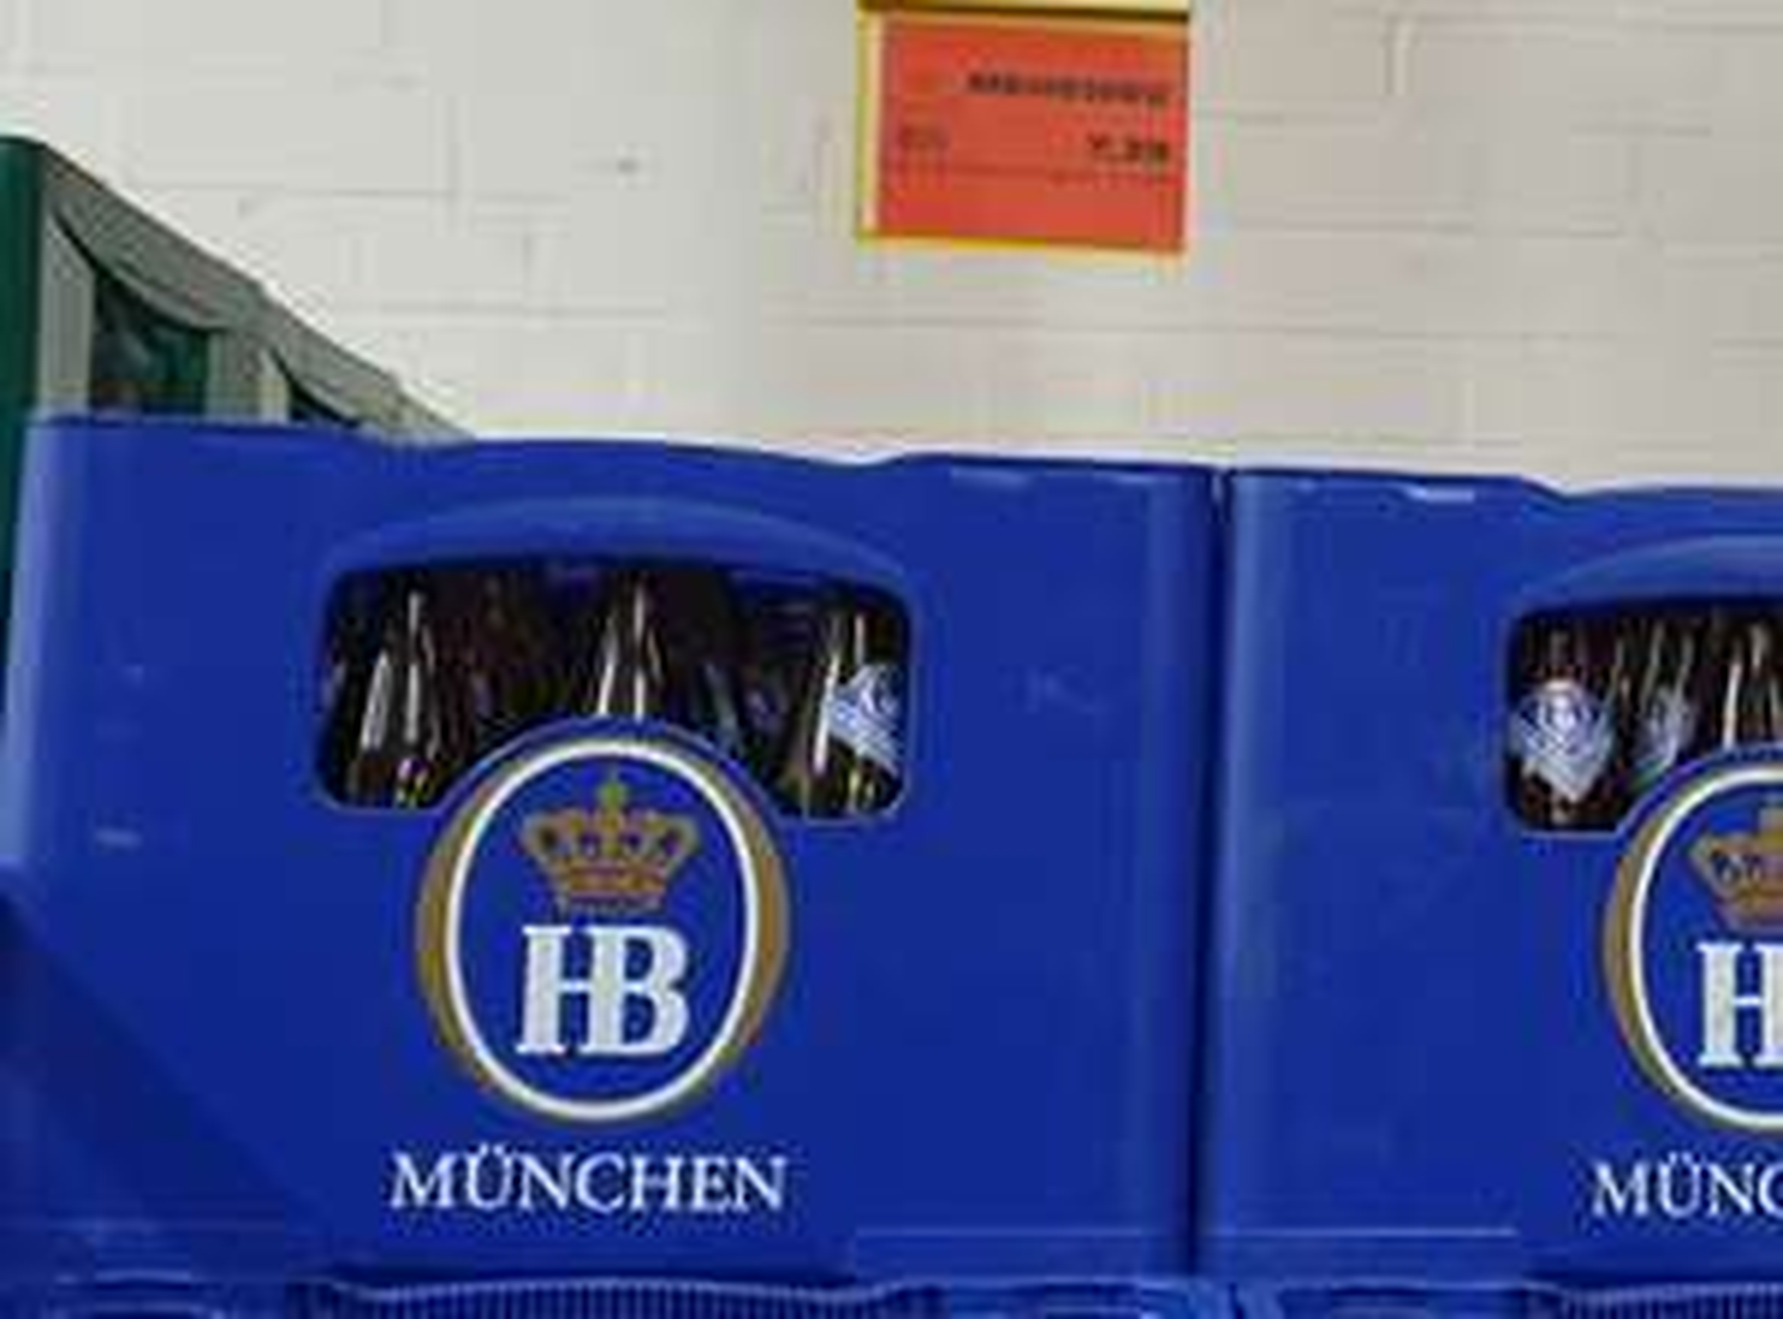 [Lokal Wolfenbüttel] trinkgut - Hofbräu München Winterzwickl, 20x0,5 Liter, 5,5% / Einbecker Winterbock 6,39 EUR / Leikeim 6,89 EUR